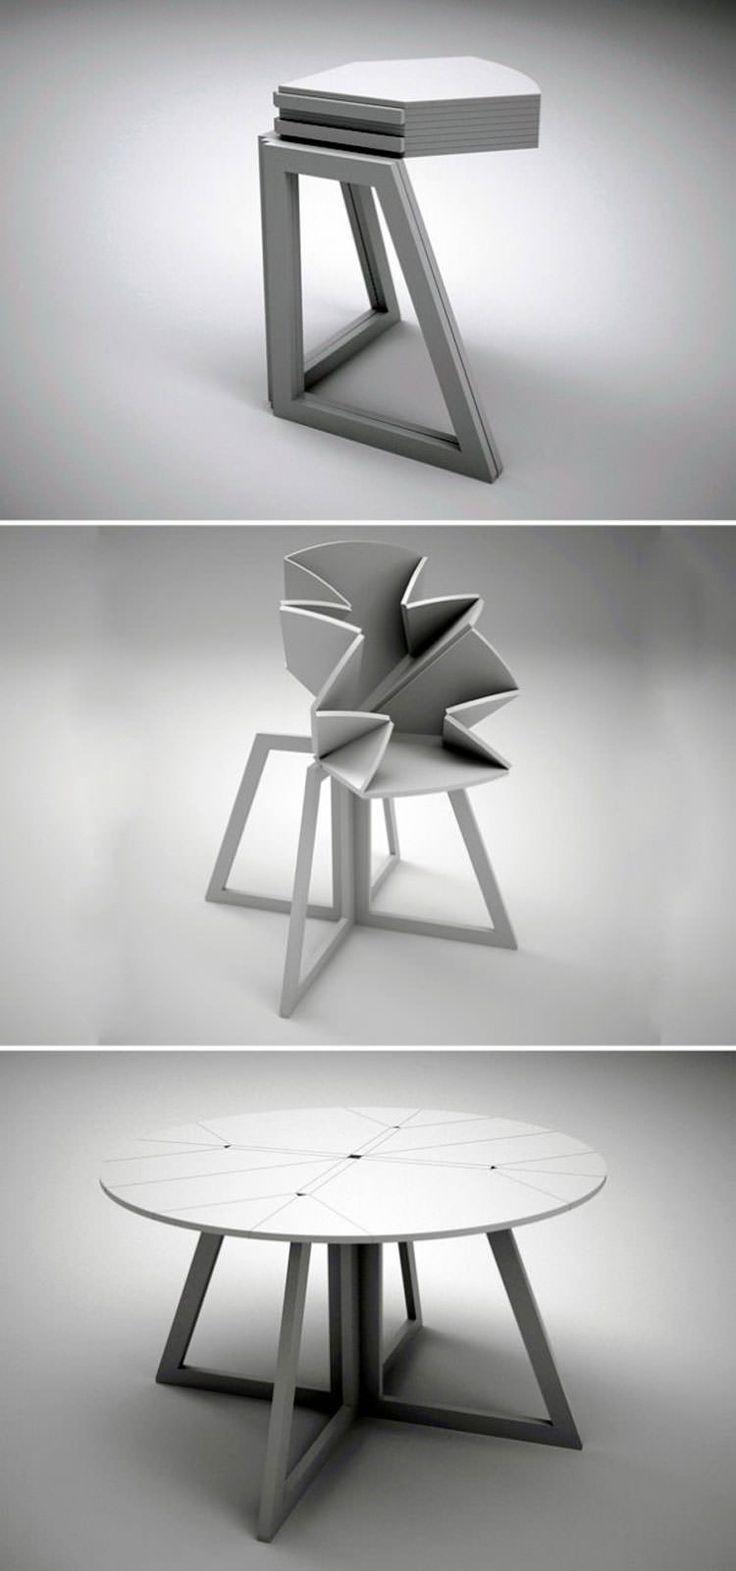 30 tavoli allungabili moderni dal design particolare for Tavoli rotondi moderni allungabili